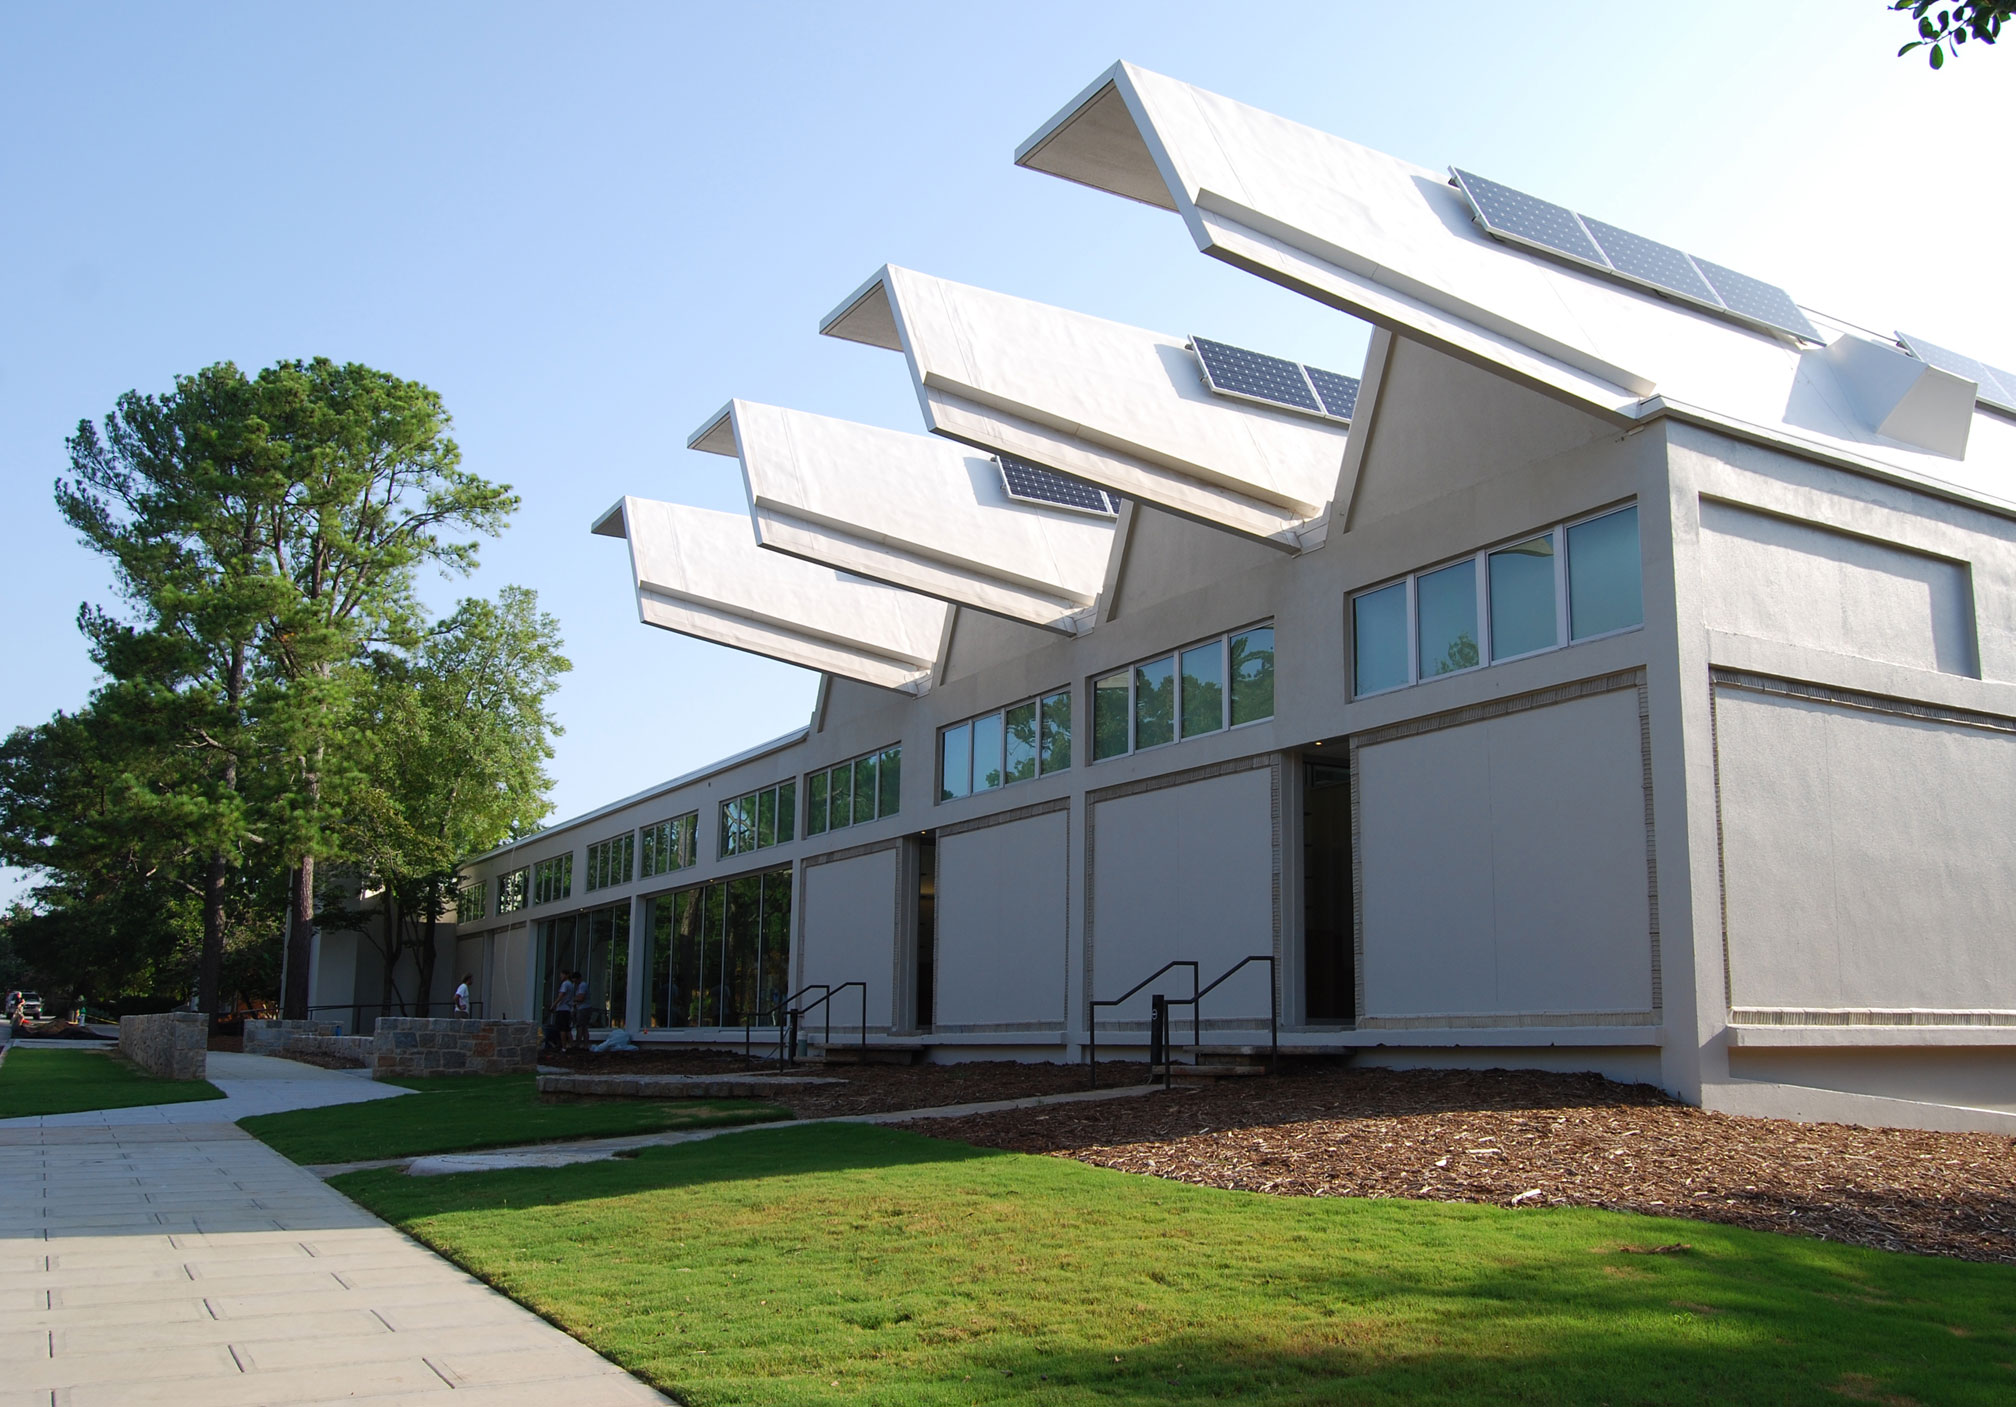 university-of-georgia-solar-powered-school-of-environmental-design